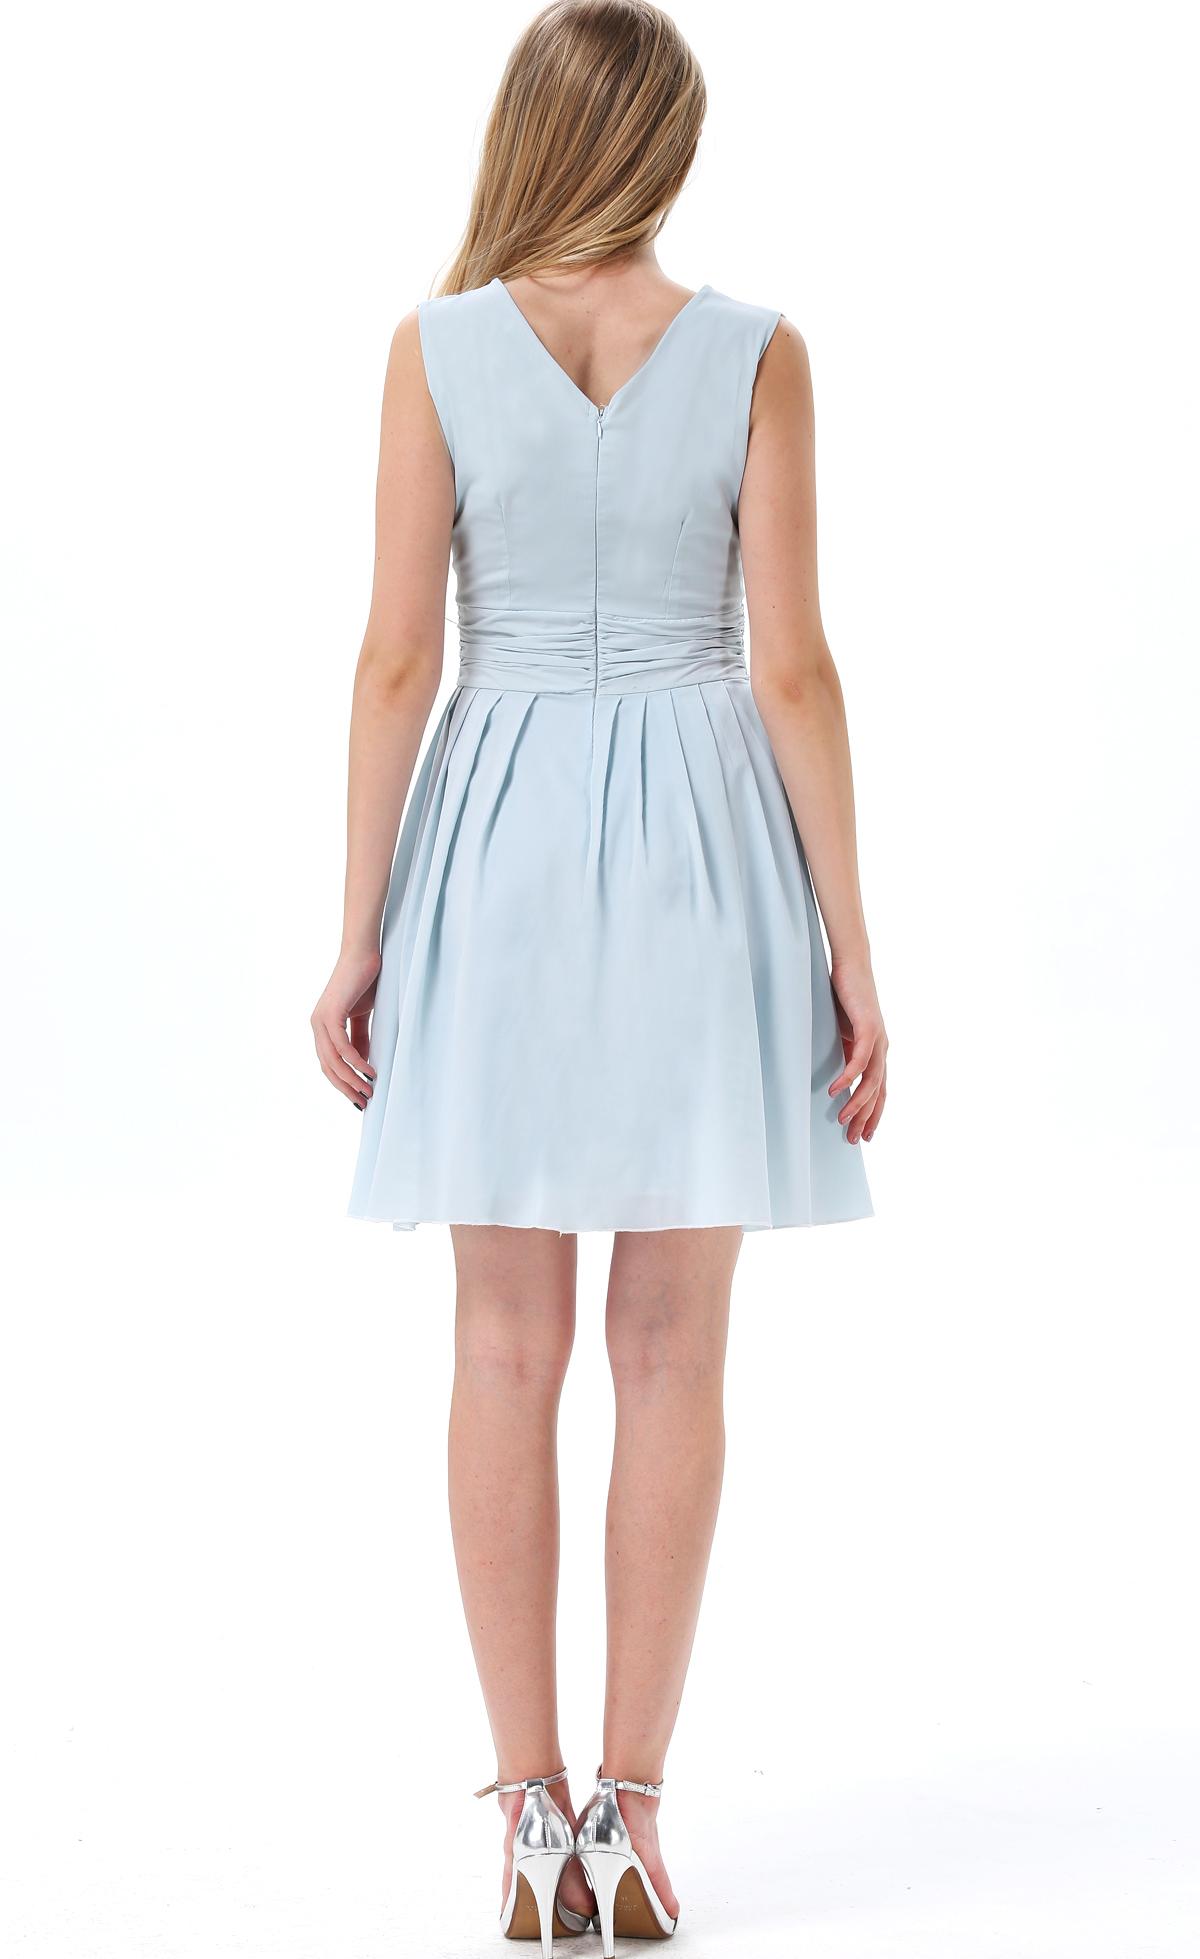 Blue Sleeveless Chiffon Ruffle Dress - Sheinside.com